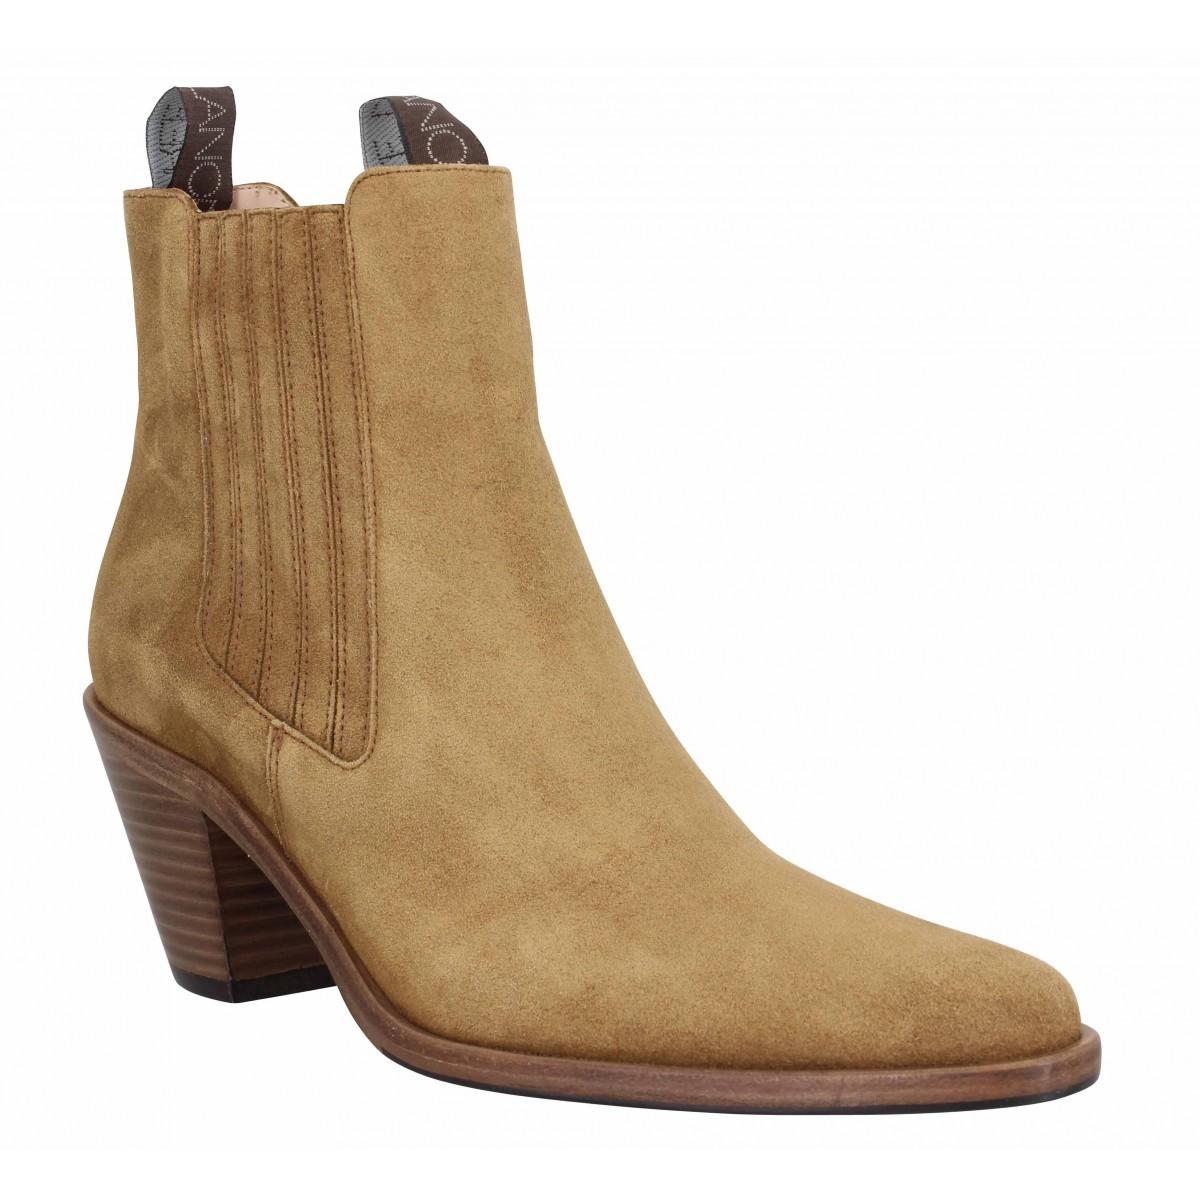 Bottines FREE LANCE Jane 7 Chelsea Boot velours Femme Cigare